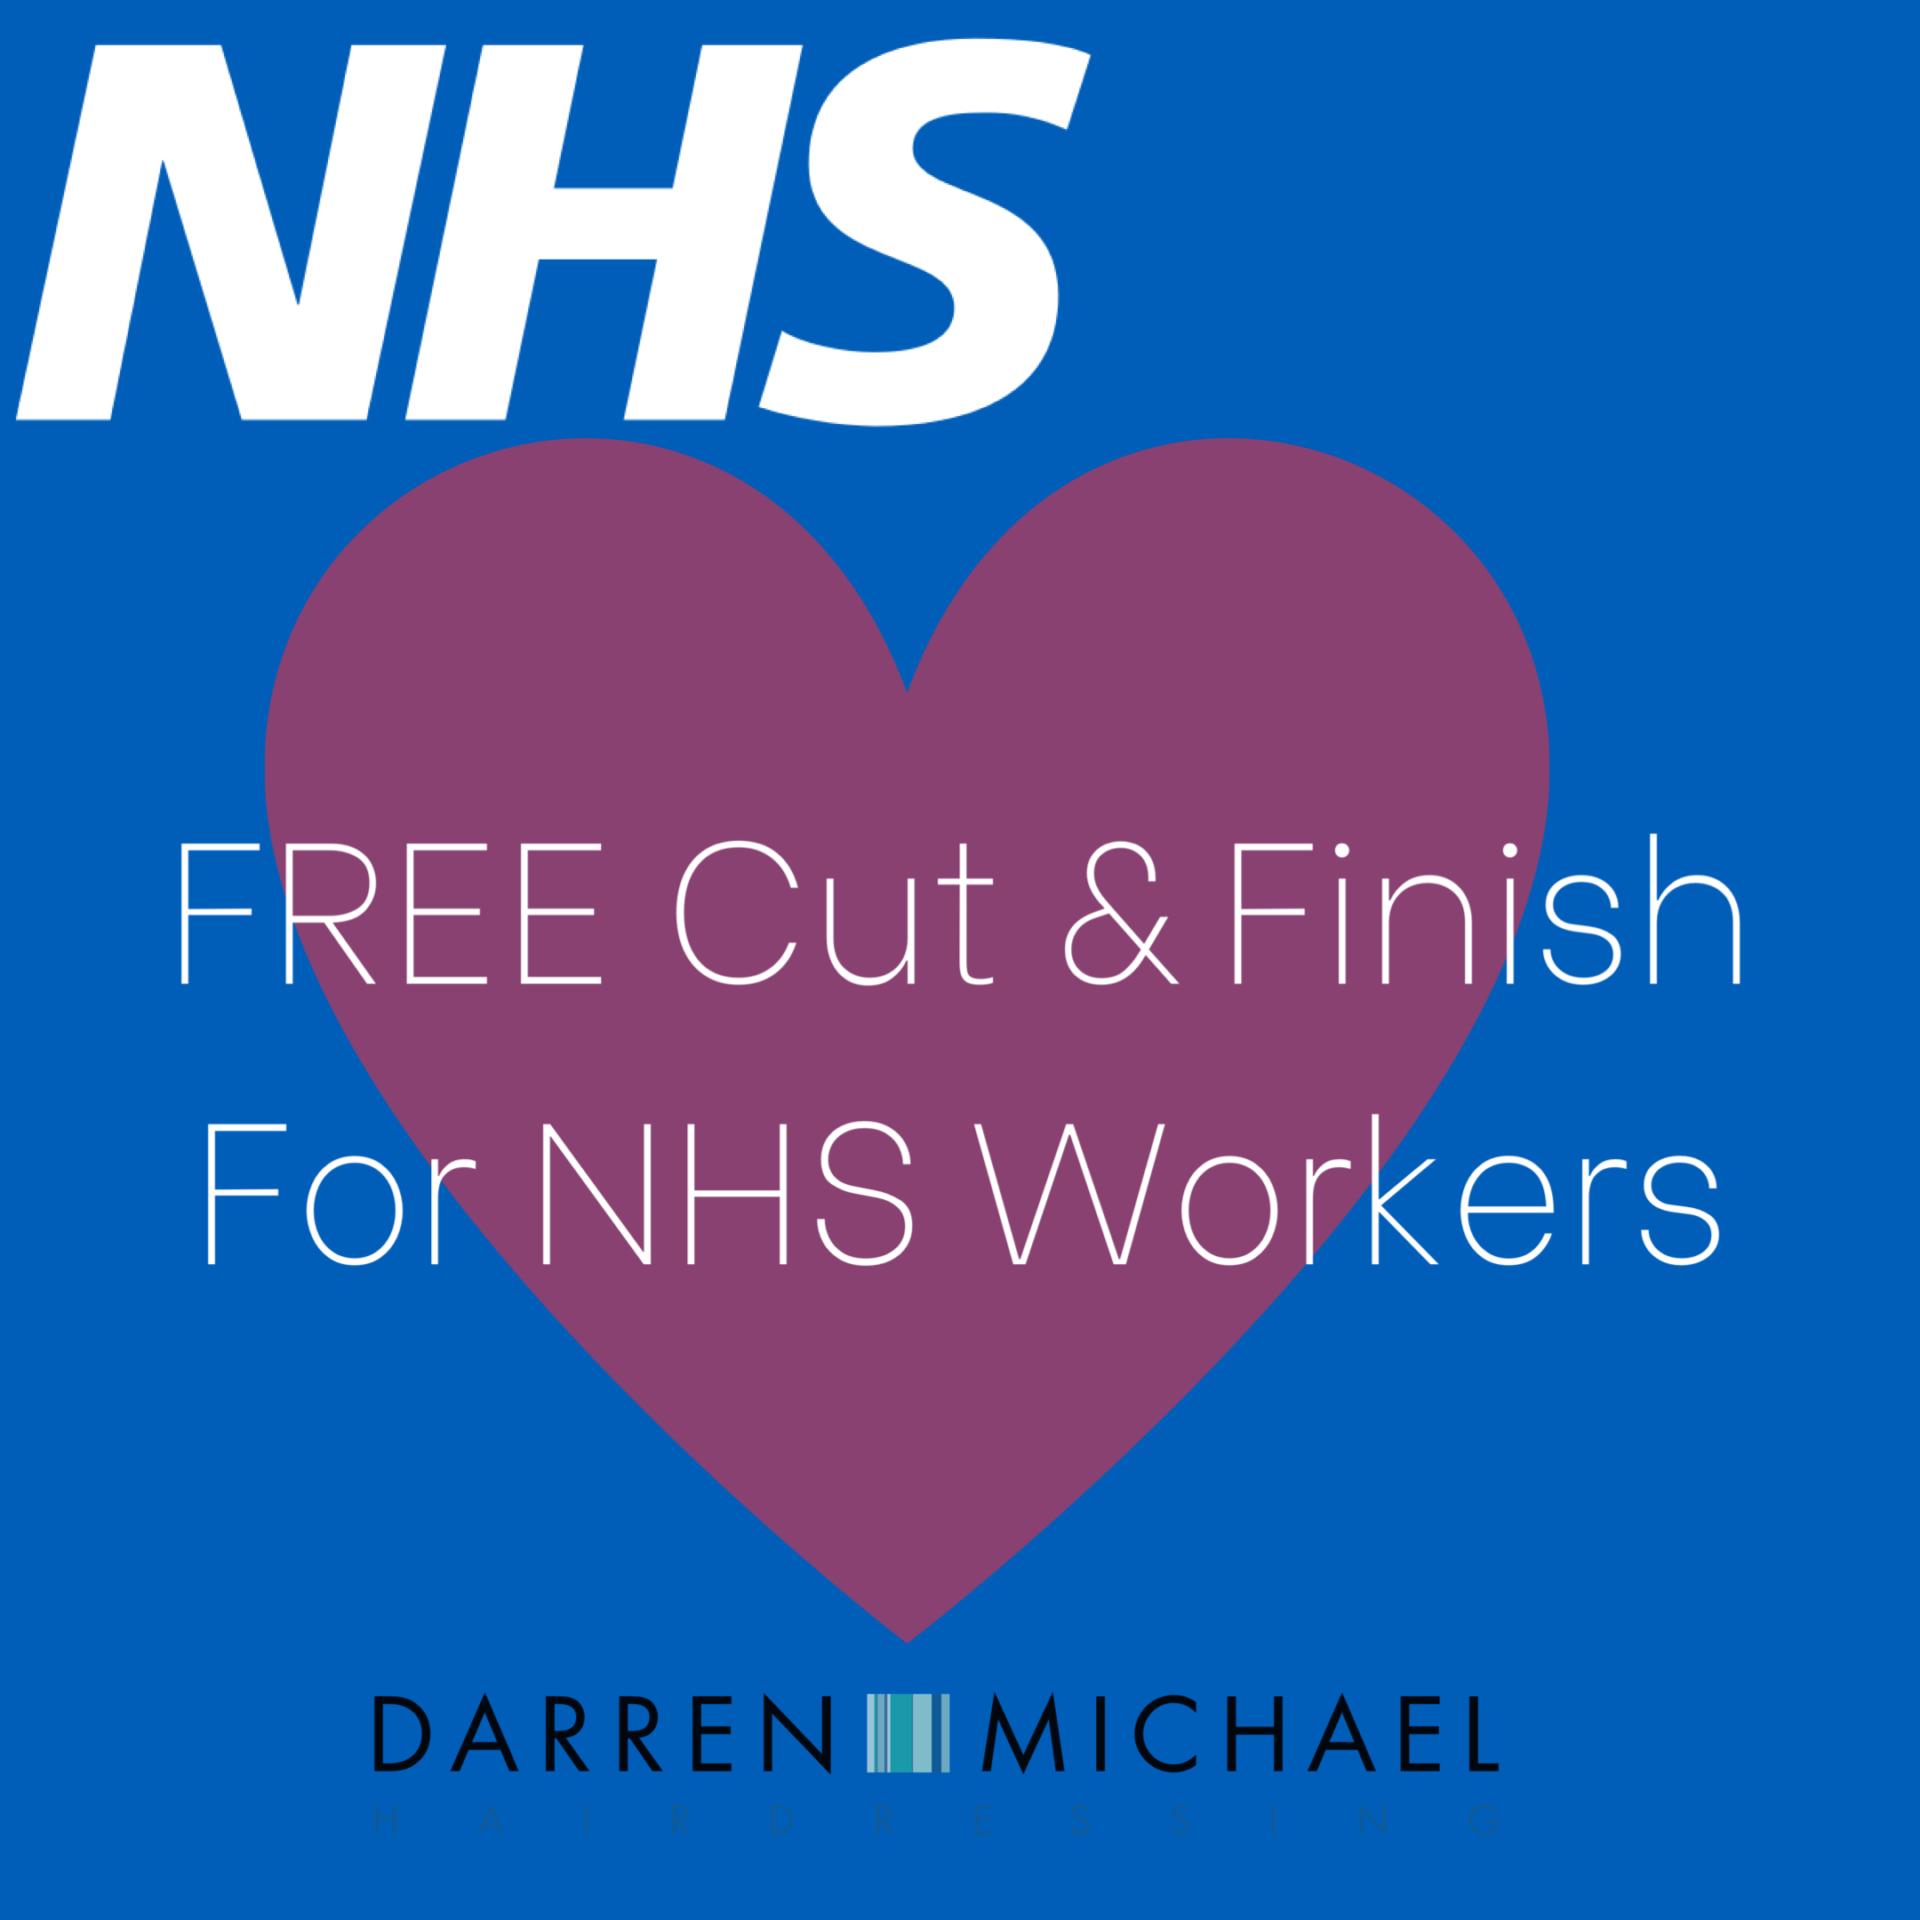 Free Cut & Style – NHS